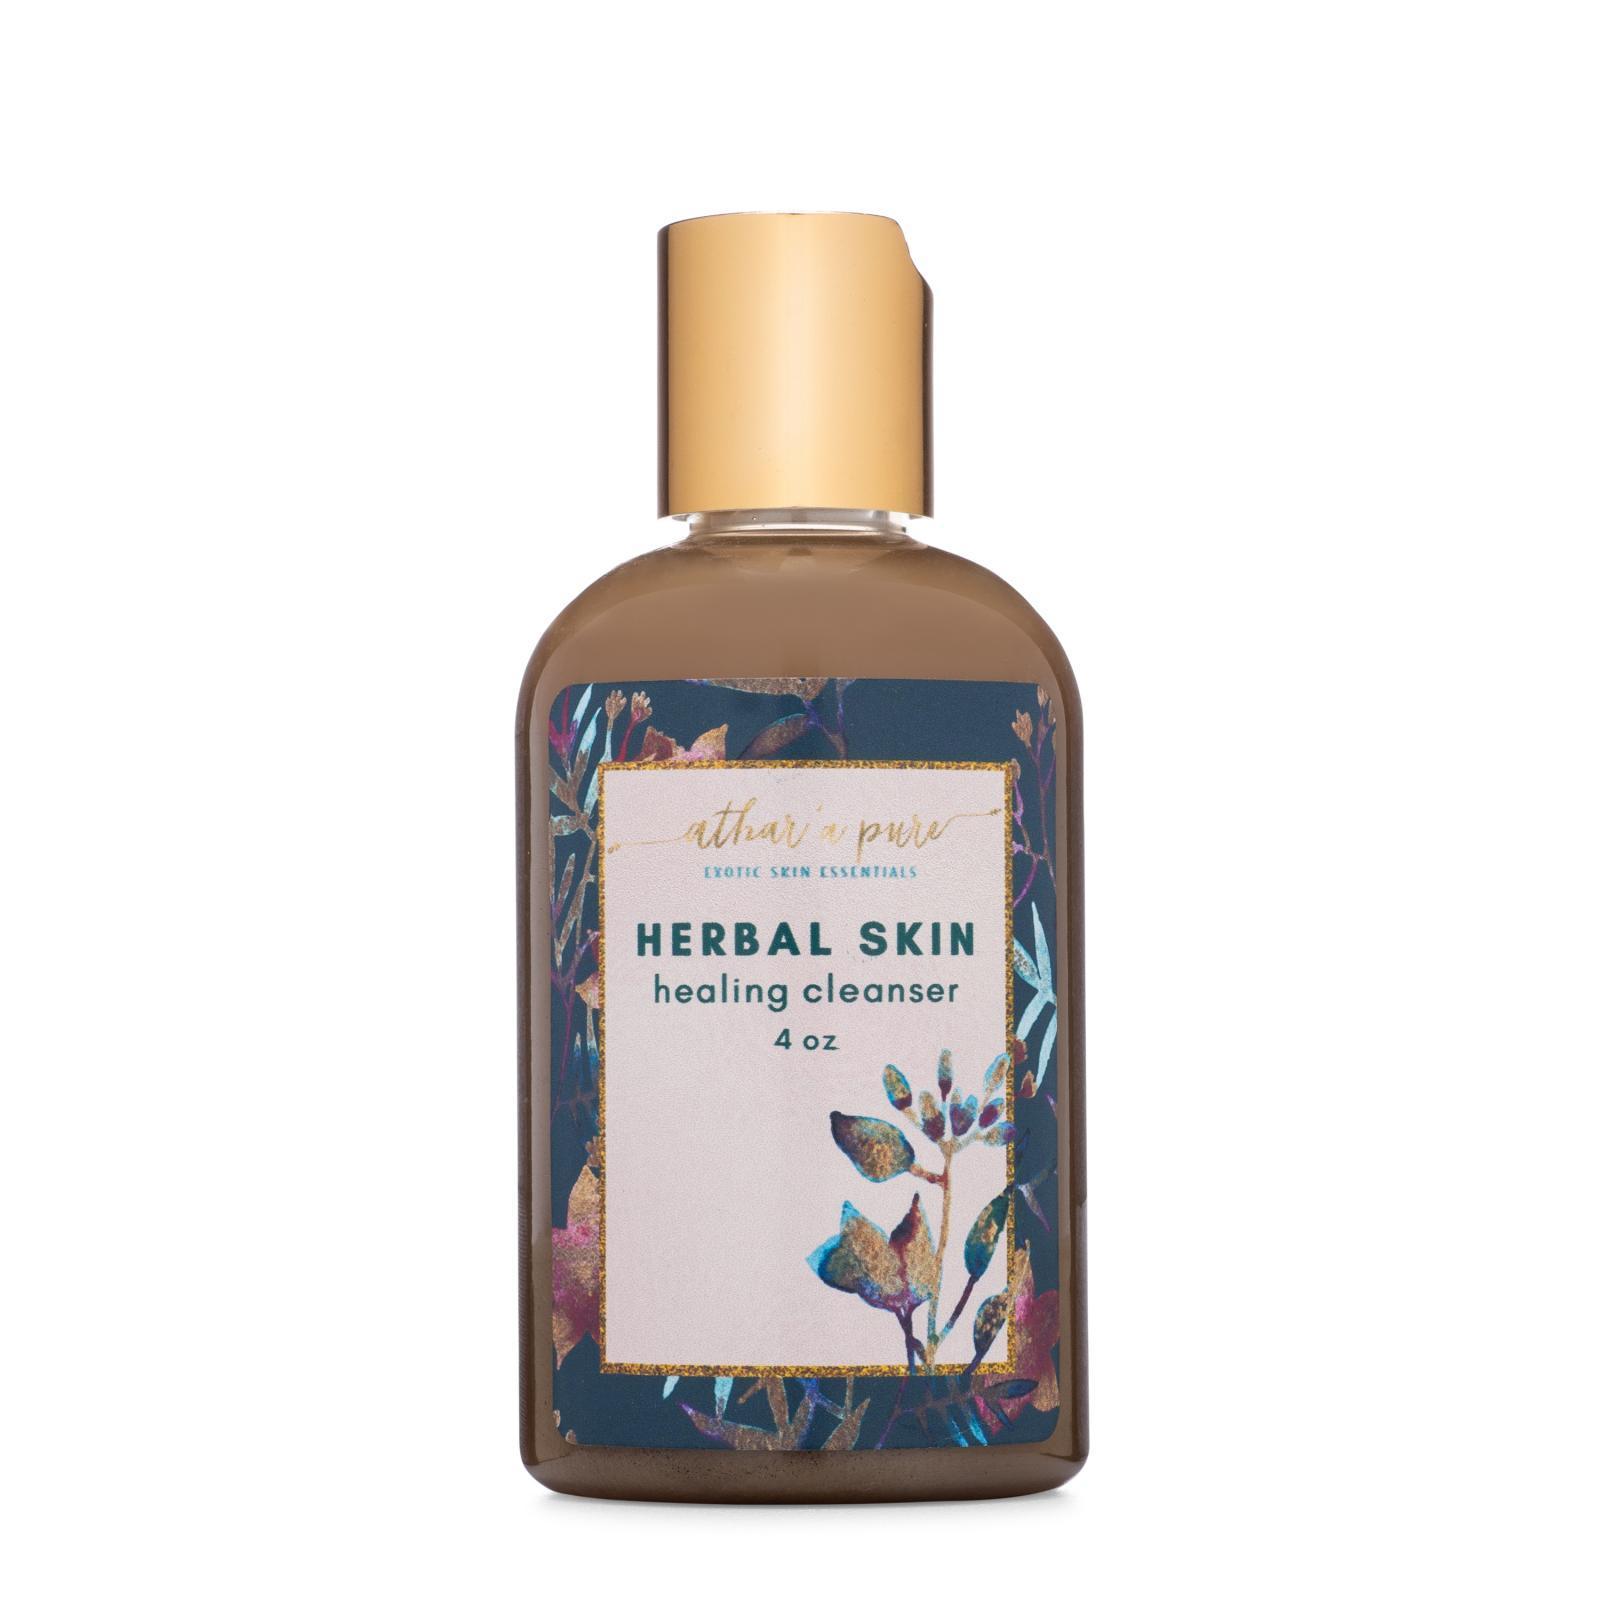 Herbal Skin Healing Cleanser (100& Natural, Vegan, Organic Face Wash)